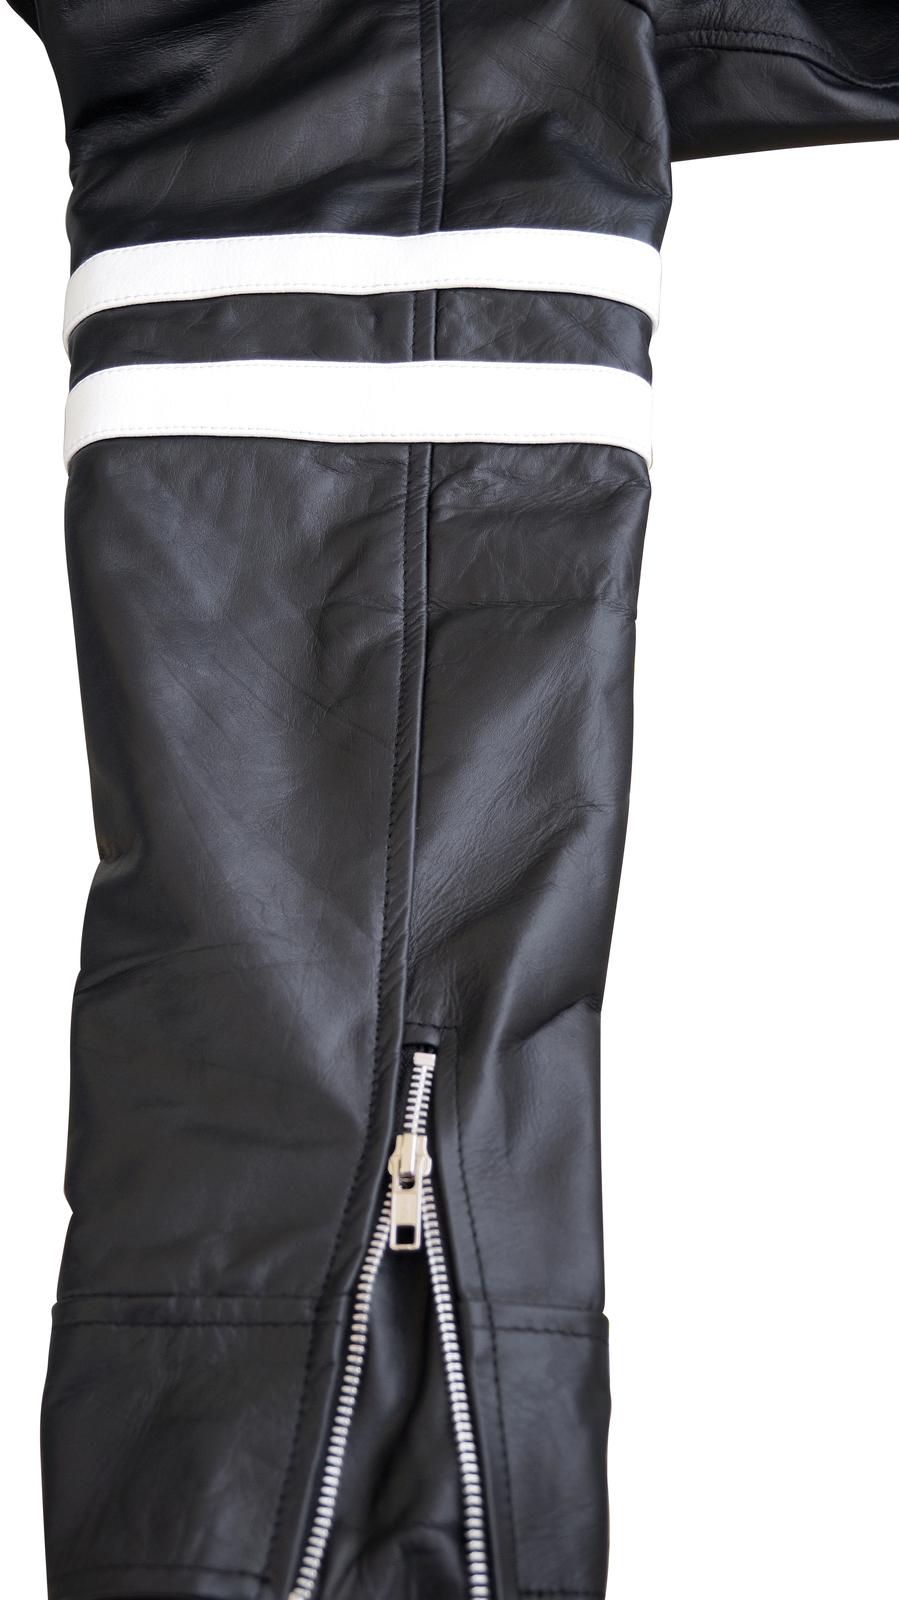 NWT Alex Mercer Prototype PS3 Premium Genuine Pure Real Leather Jacket Costume image 4